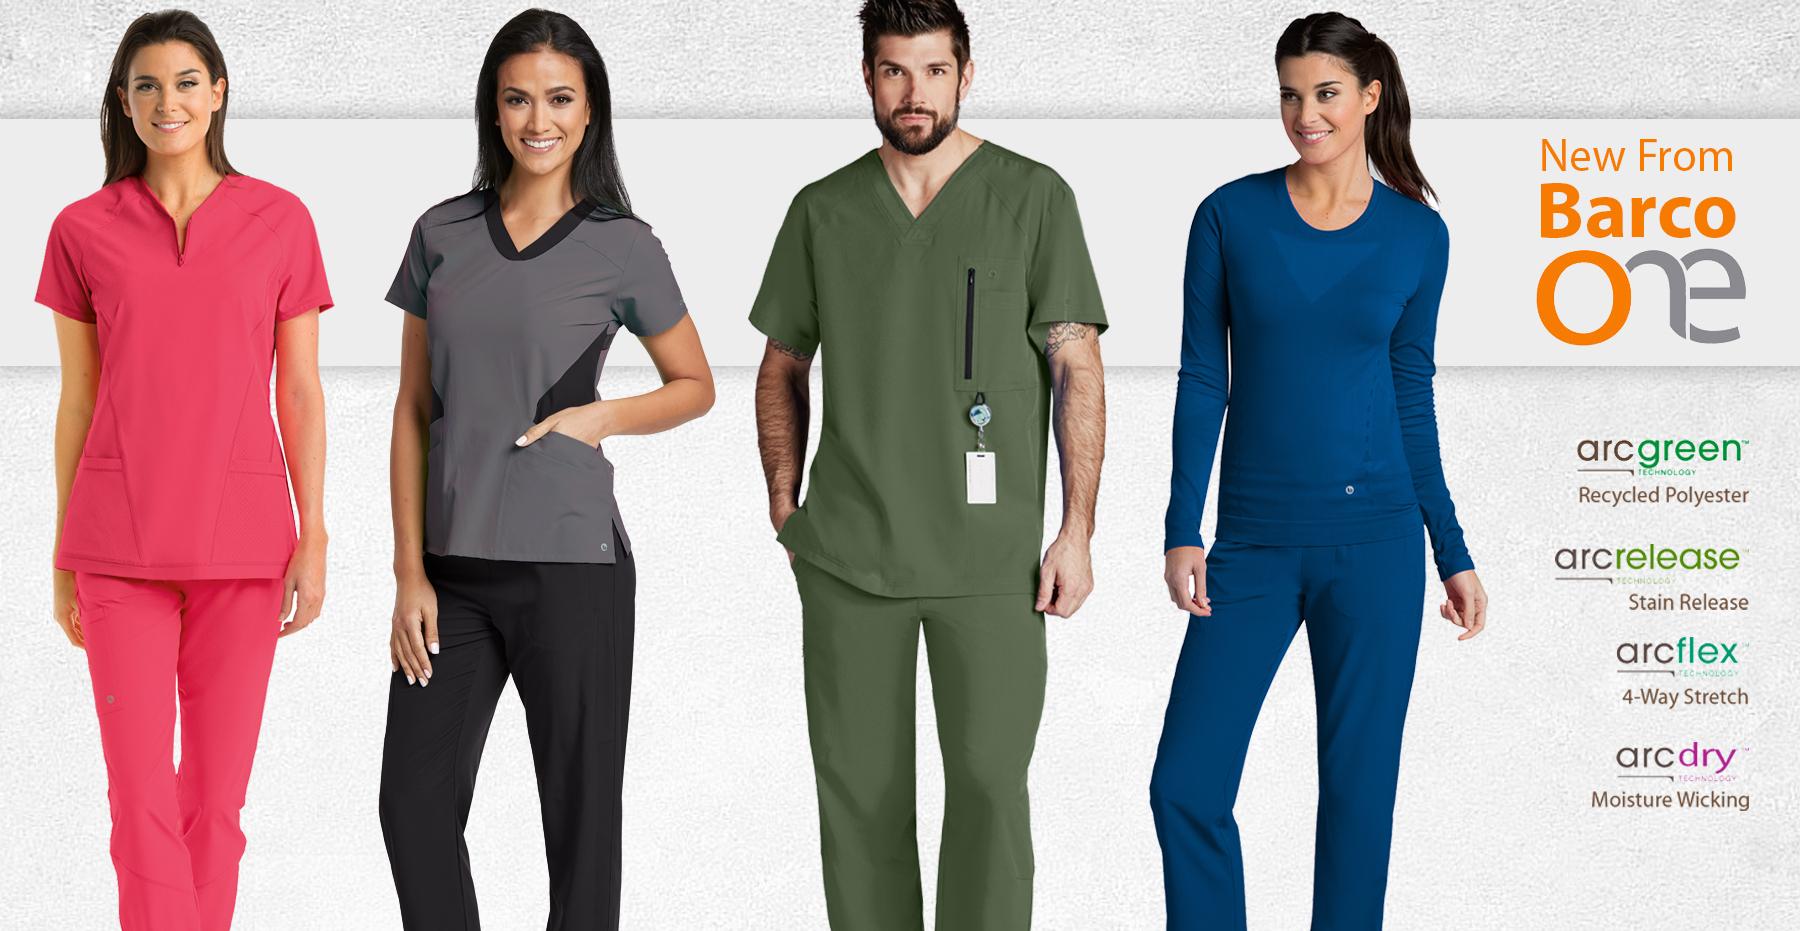 New Barco ONE Nursing Scrubs & Medical Uniforms